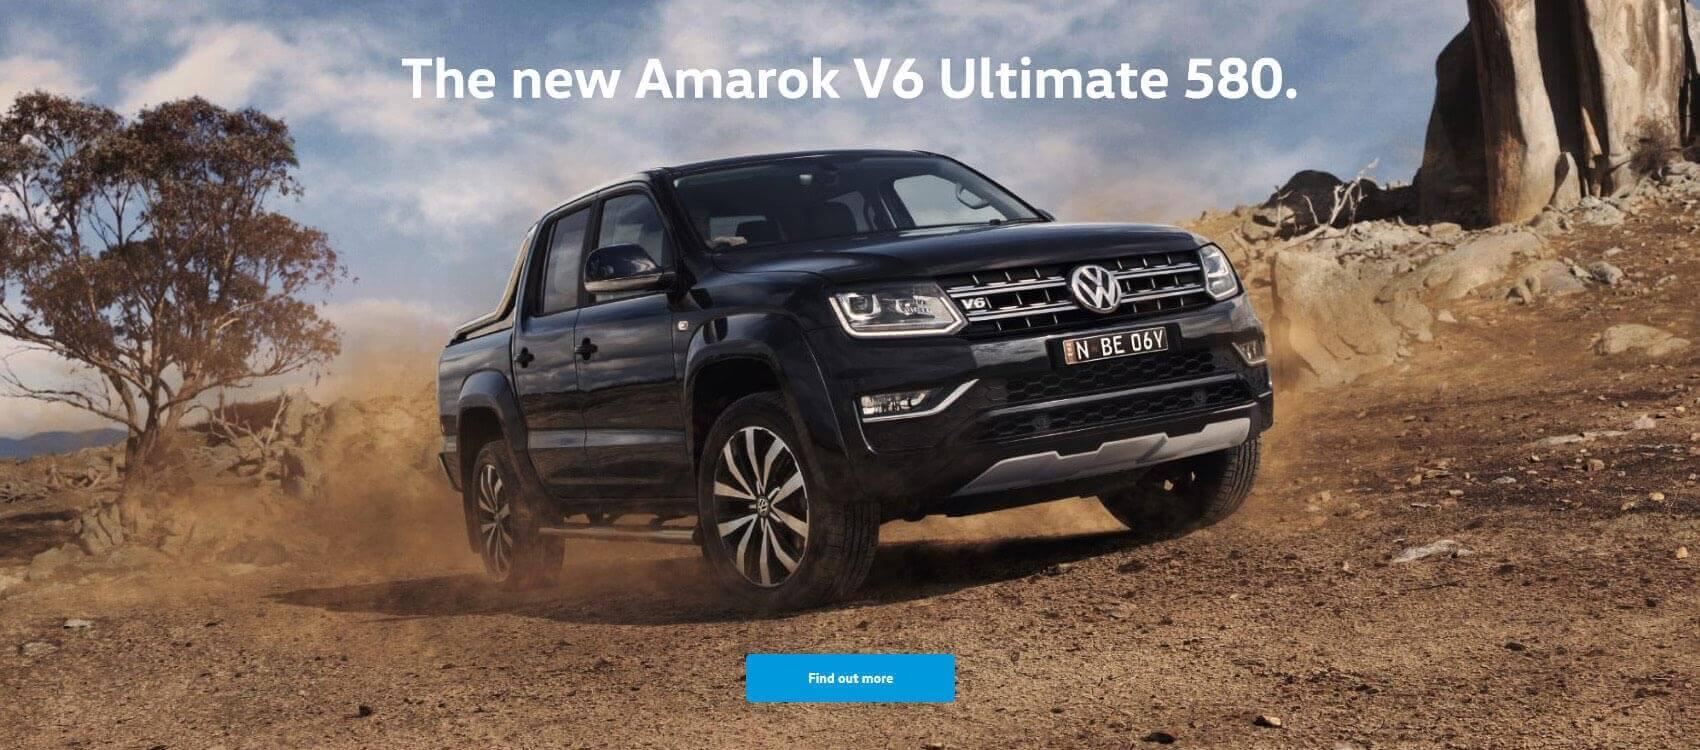 The new Amarok V6 Ultimate 580.